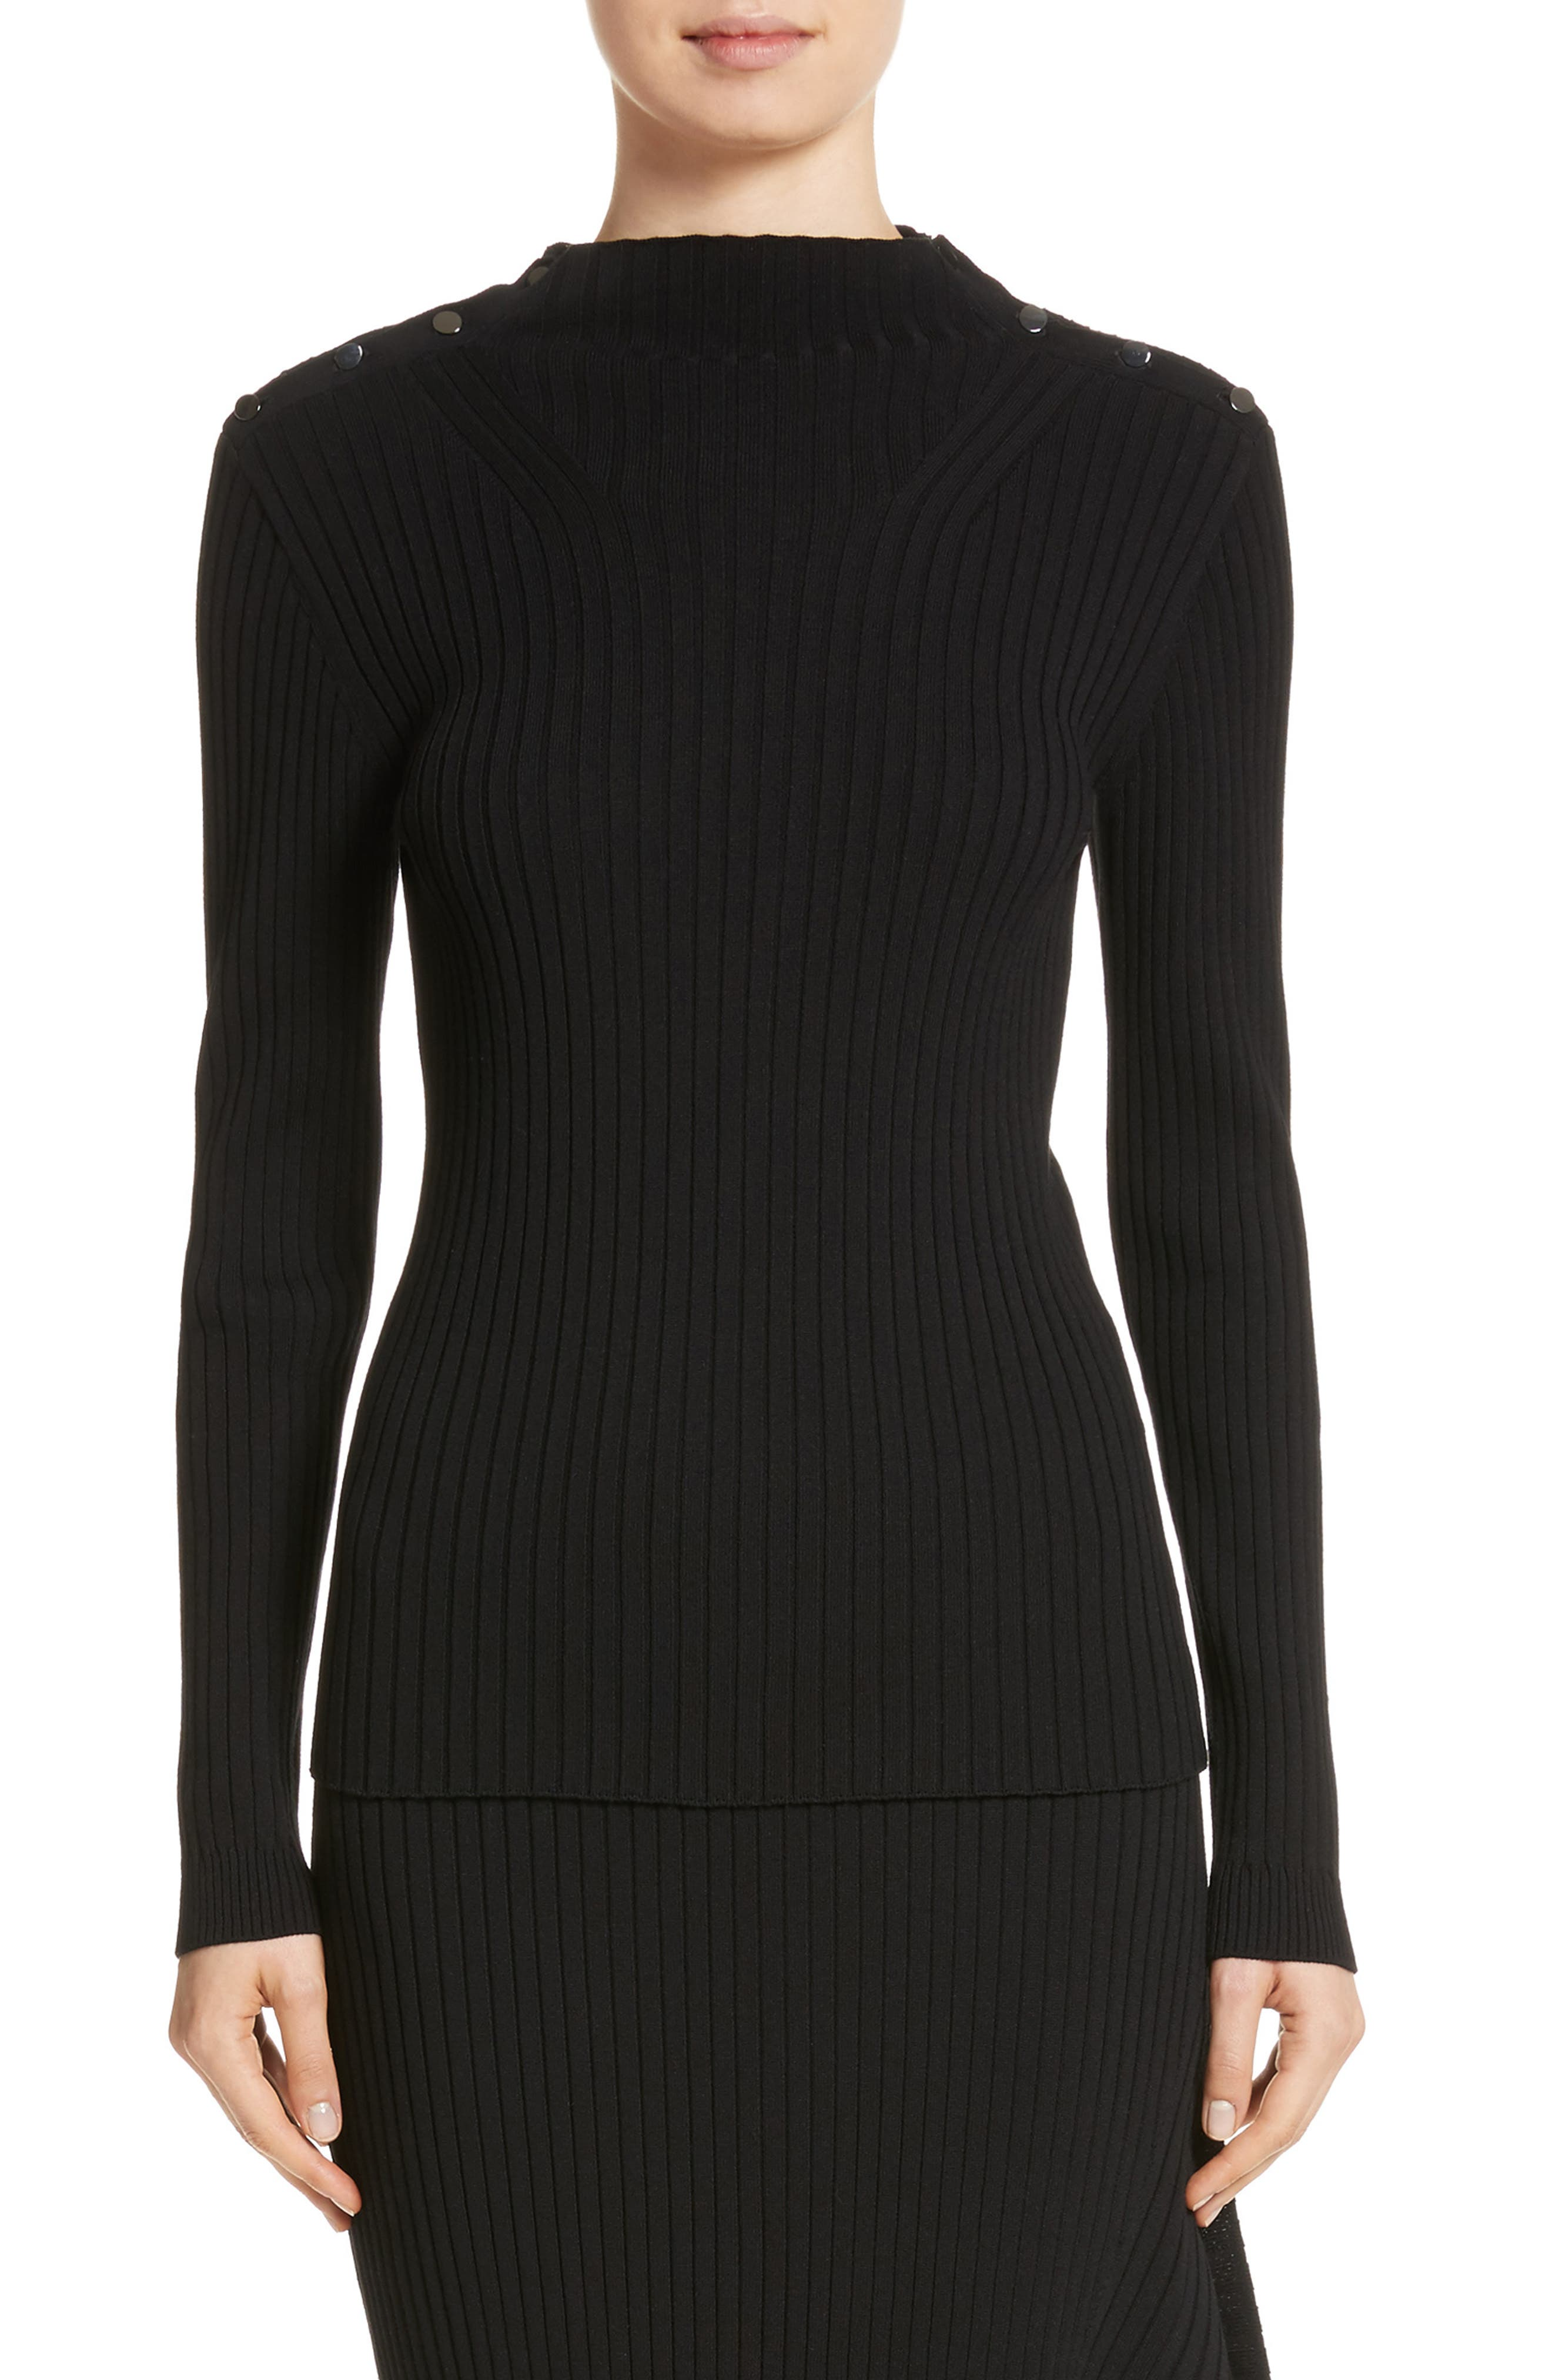 Main Image - St. John Collection Flat Rib Knit Mock Neck Sweater